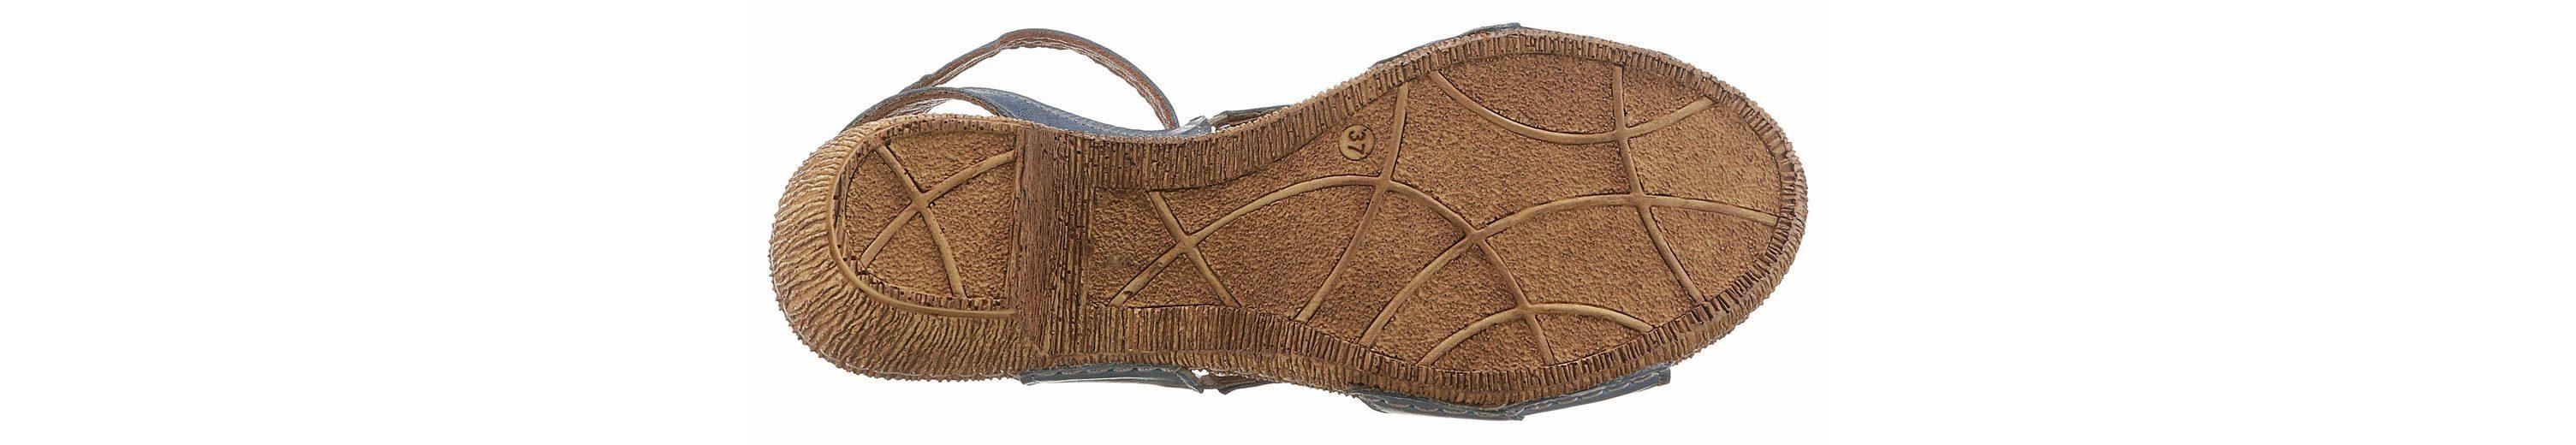 Gemini Sandalette, mit Laufsohle in Holz-Optik